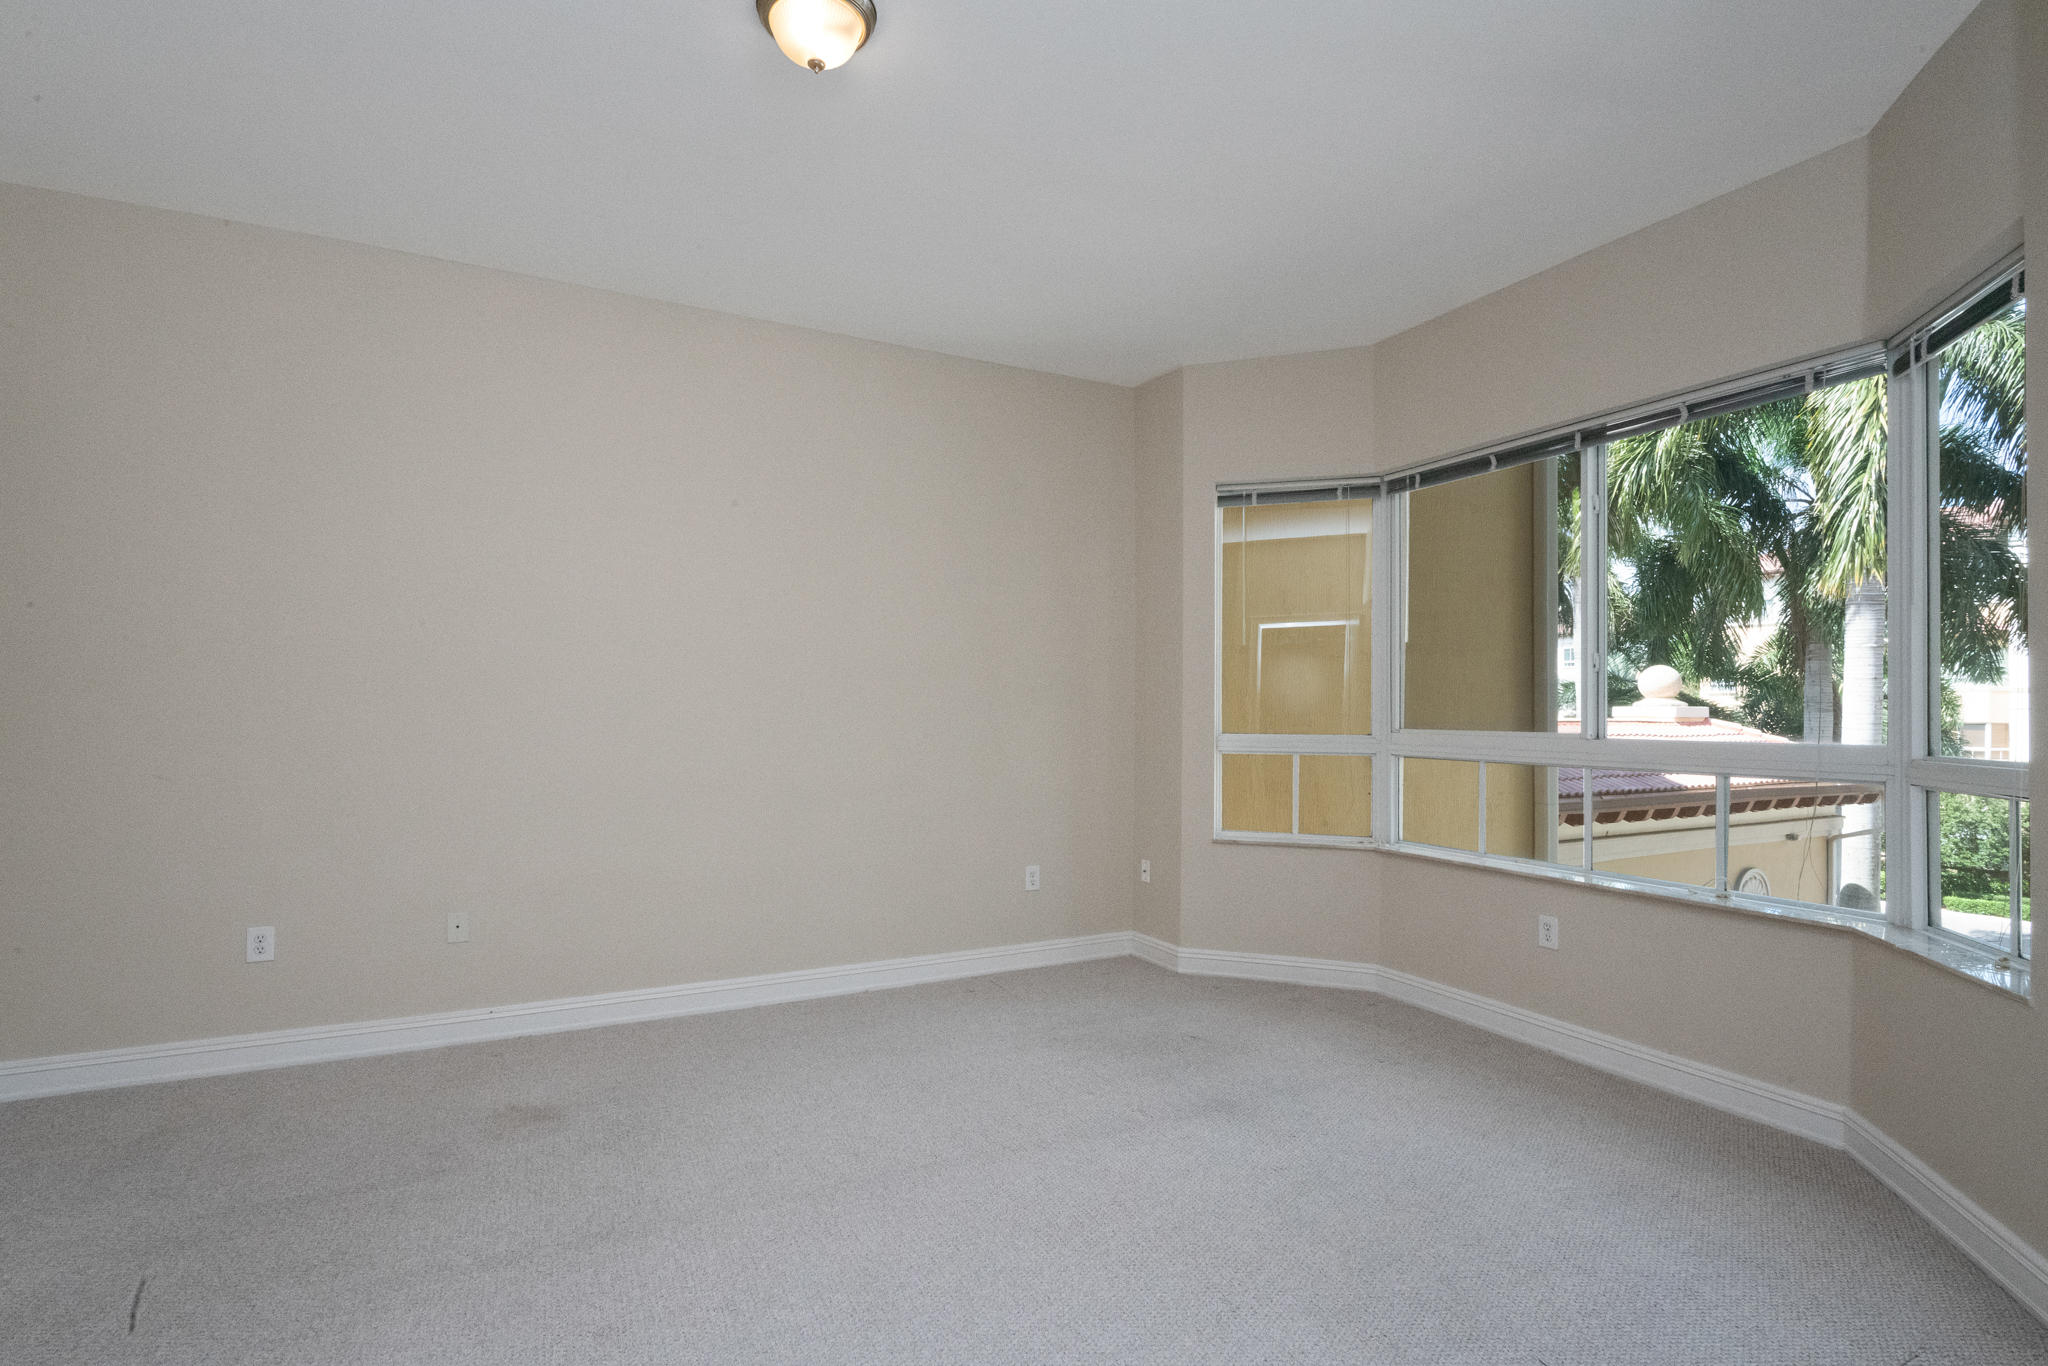 Image 20 For 16100 Emerald Estates Drive 390